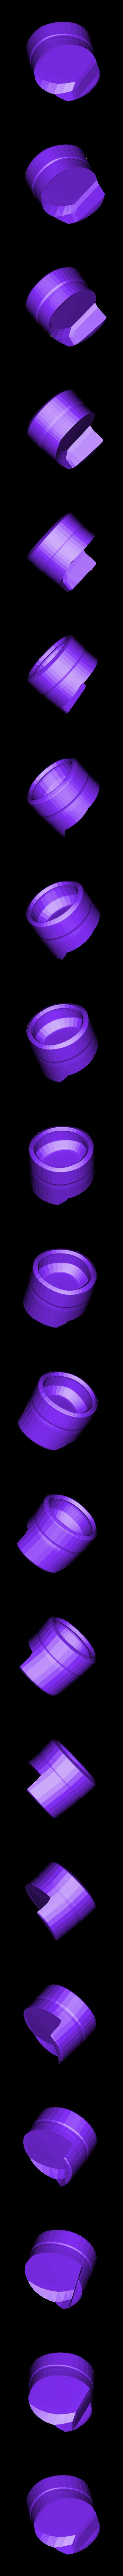 Lucio_hoseMntE_rgt.stl Download free STL file Overwatch Lucio Blaster • 3D printer object, Adafruit